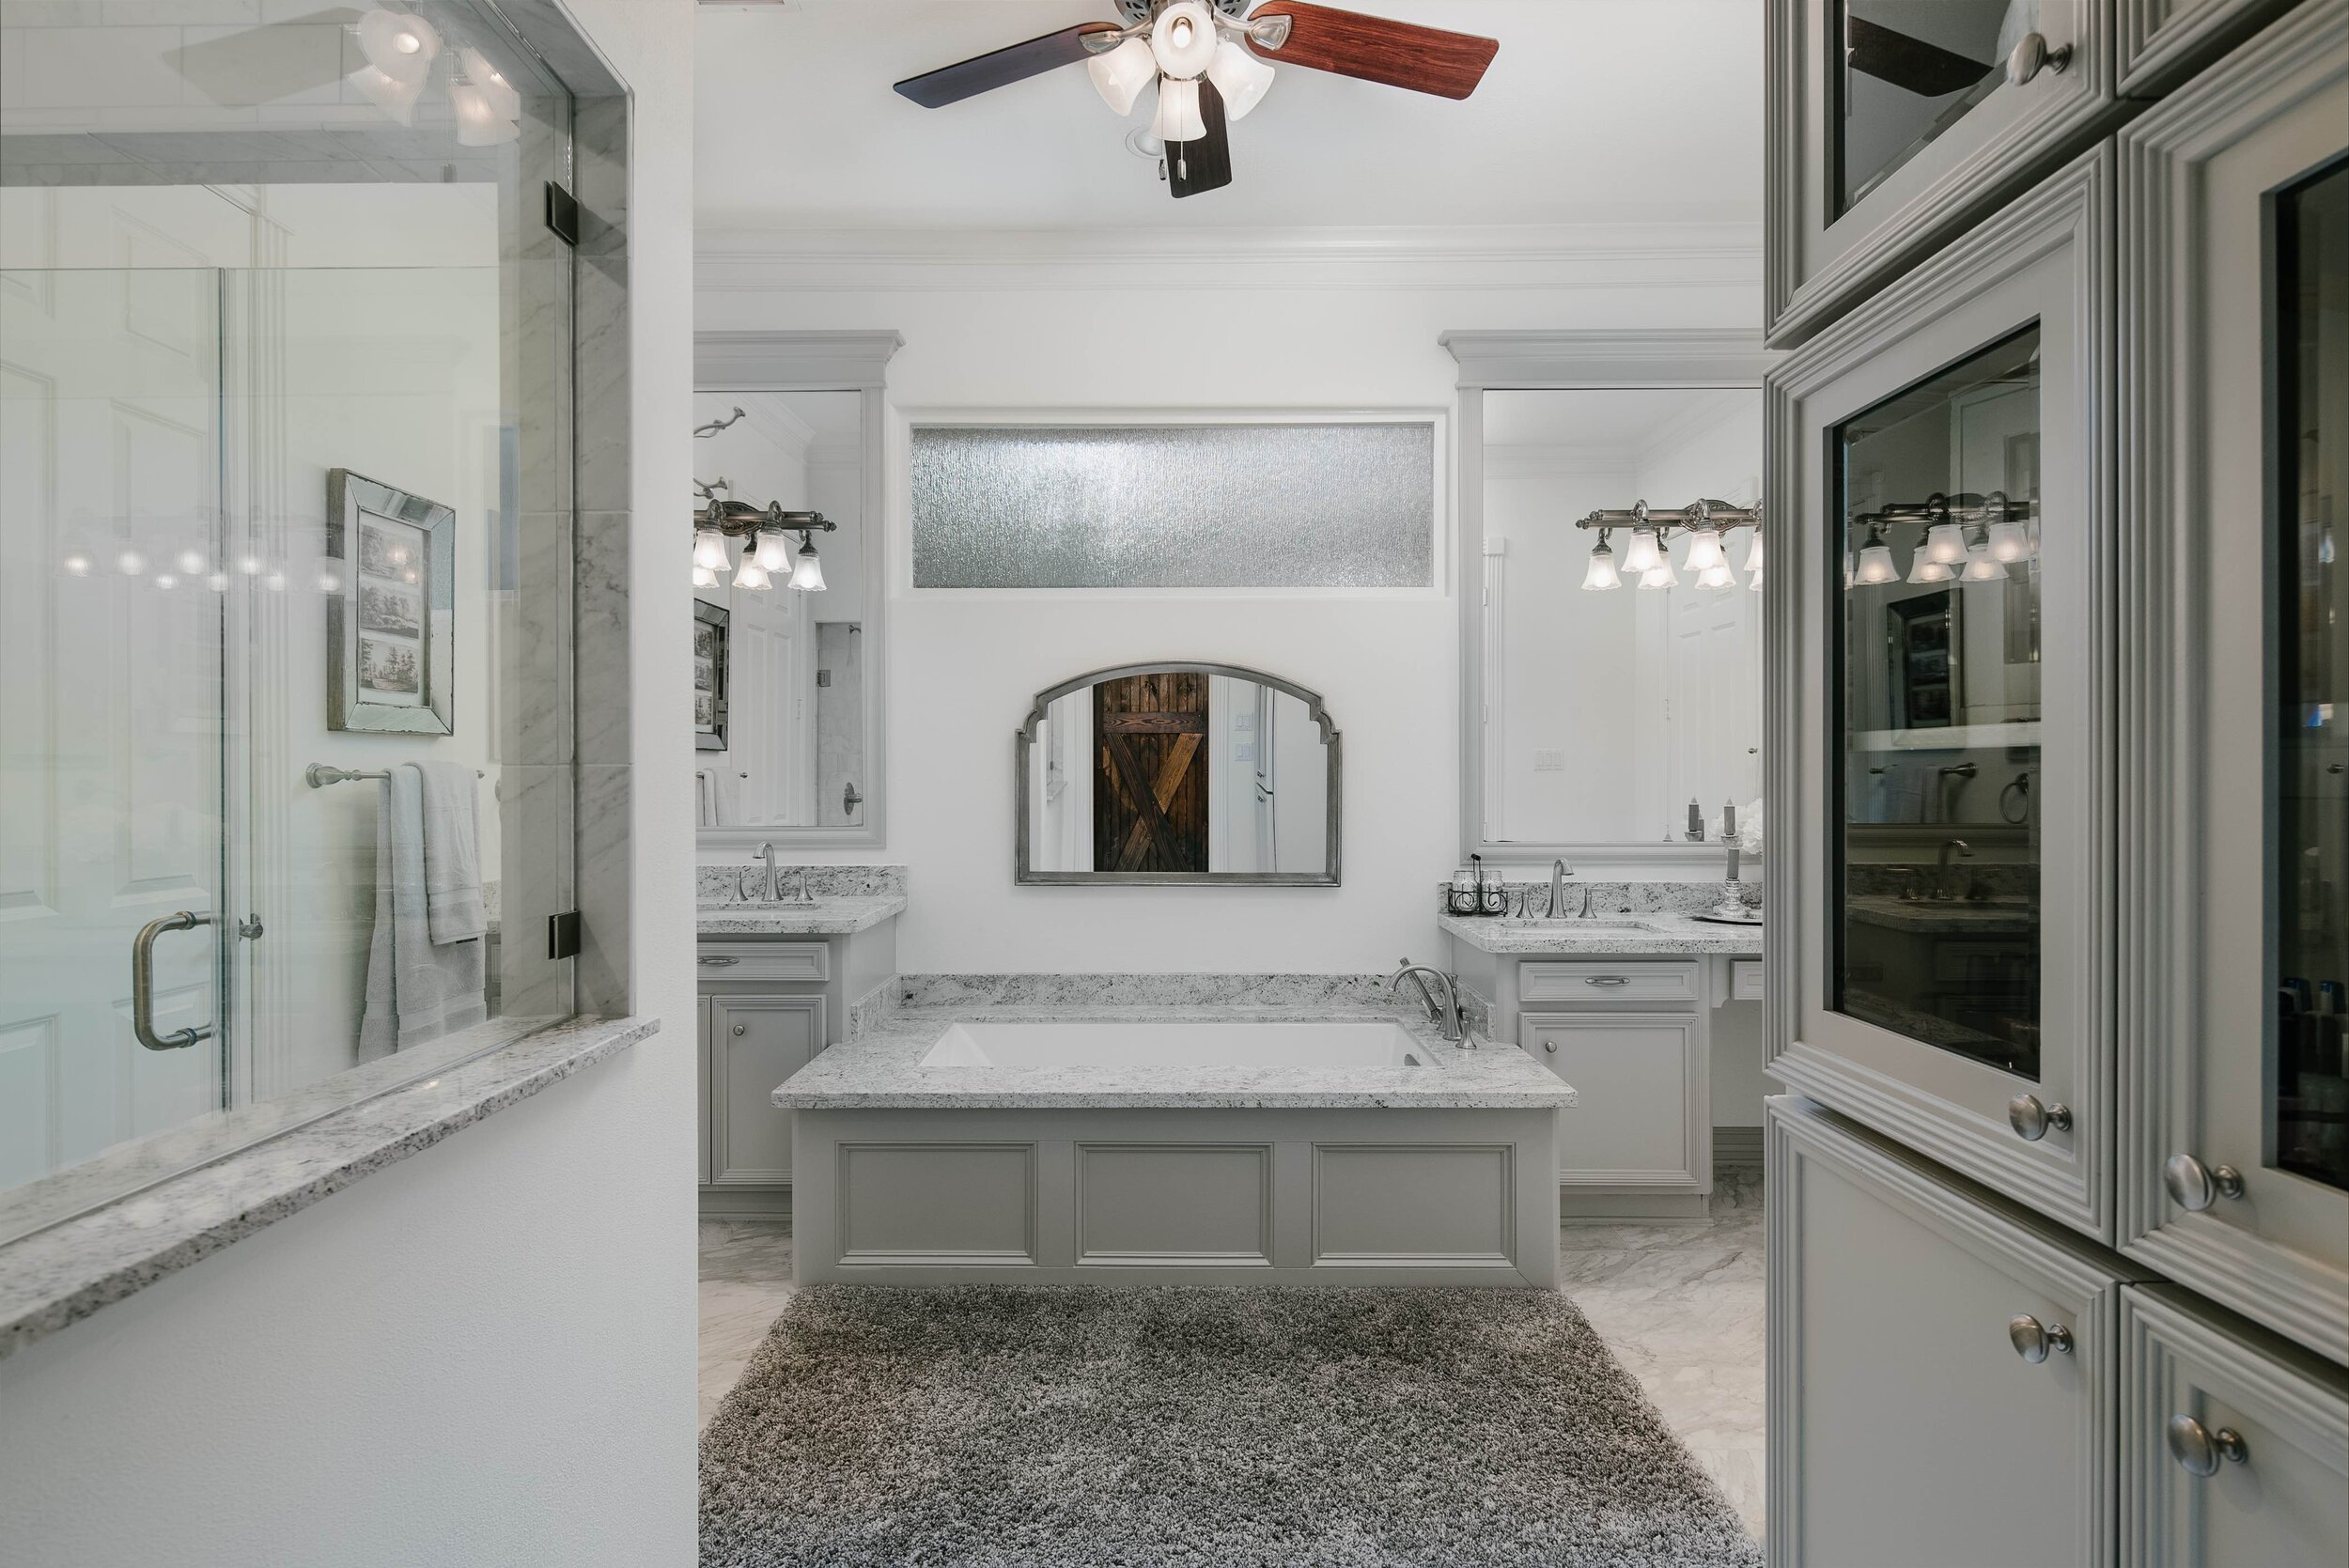 Gorgeous master bathroom remodel. Farmhouse inspired, farm door, grey and white master bathroom. Frameless walk in shower, grey shower tile, undermount bathtub, soaking tub, jet tub, grey granite countertops, marble floor tile, great cabinets, frames mirror, undermount sinks.